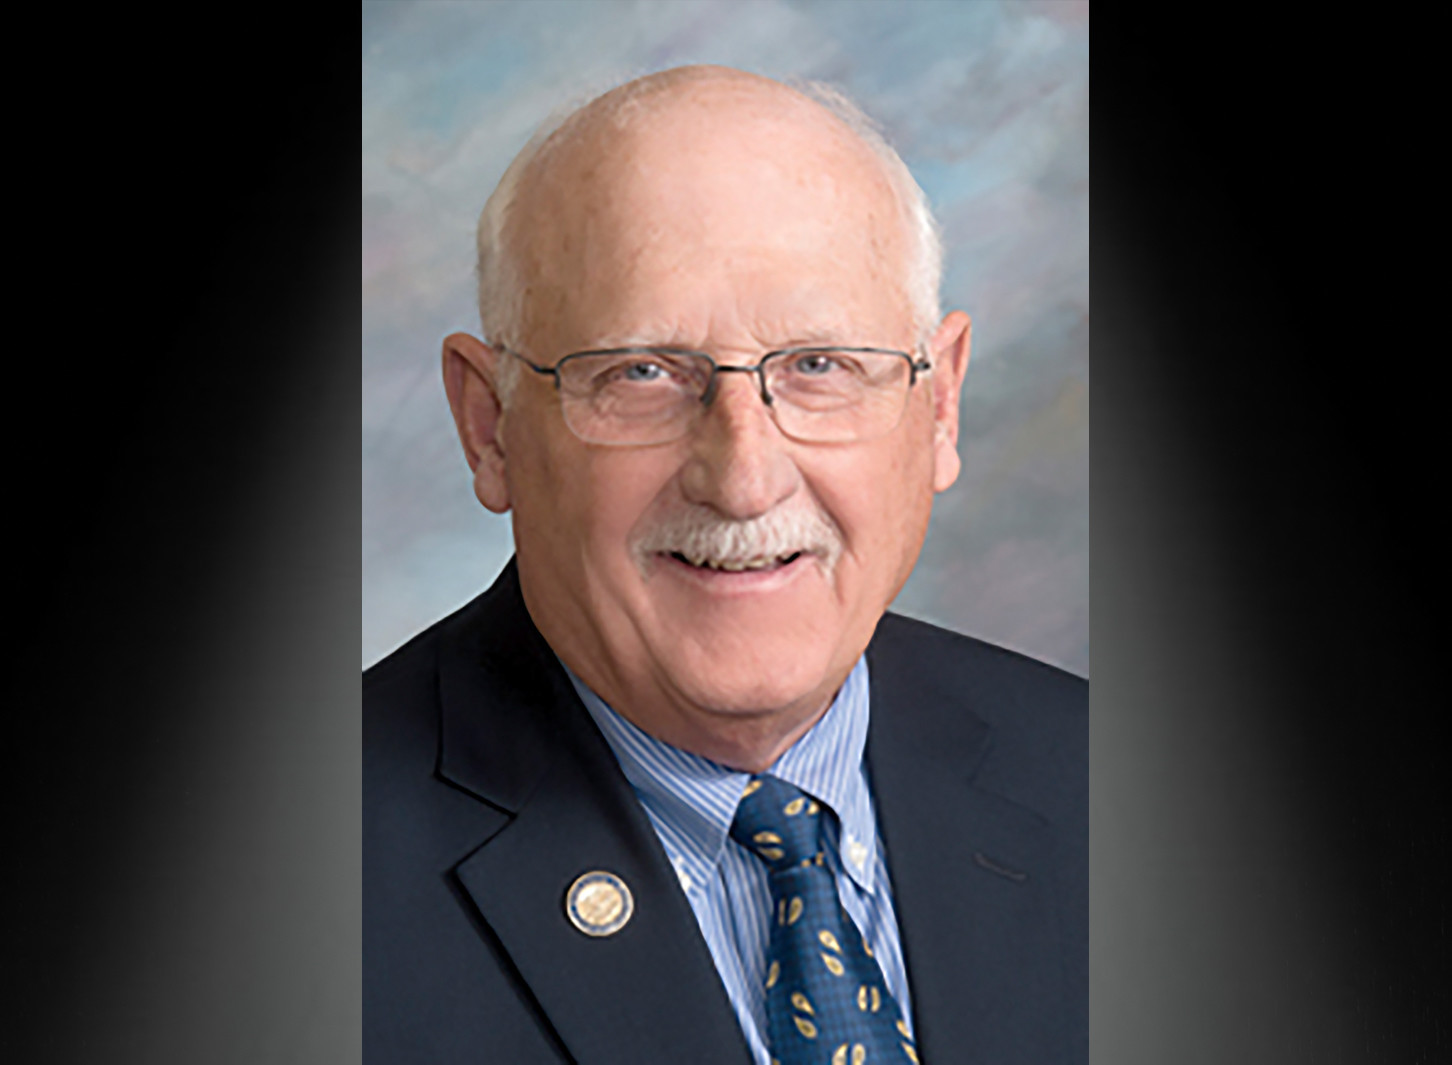 South Dakota state representative dies from coronavirus, first sitting U.S. lawmaker to die from COVID-19